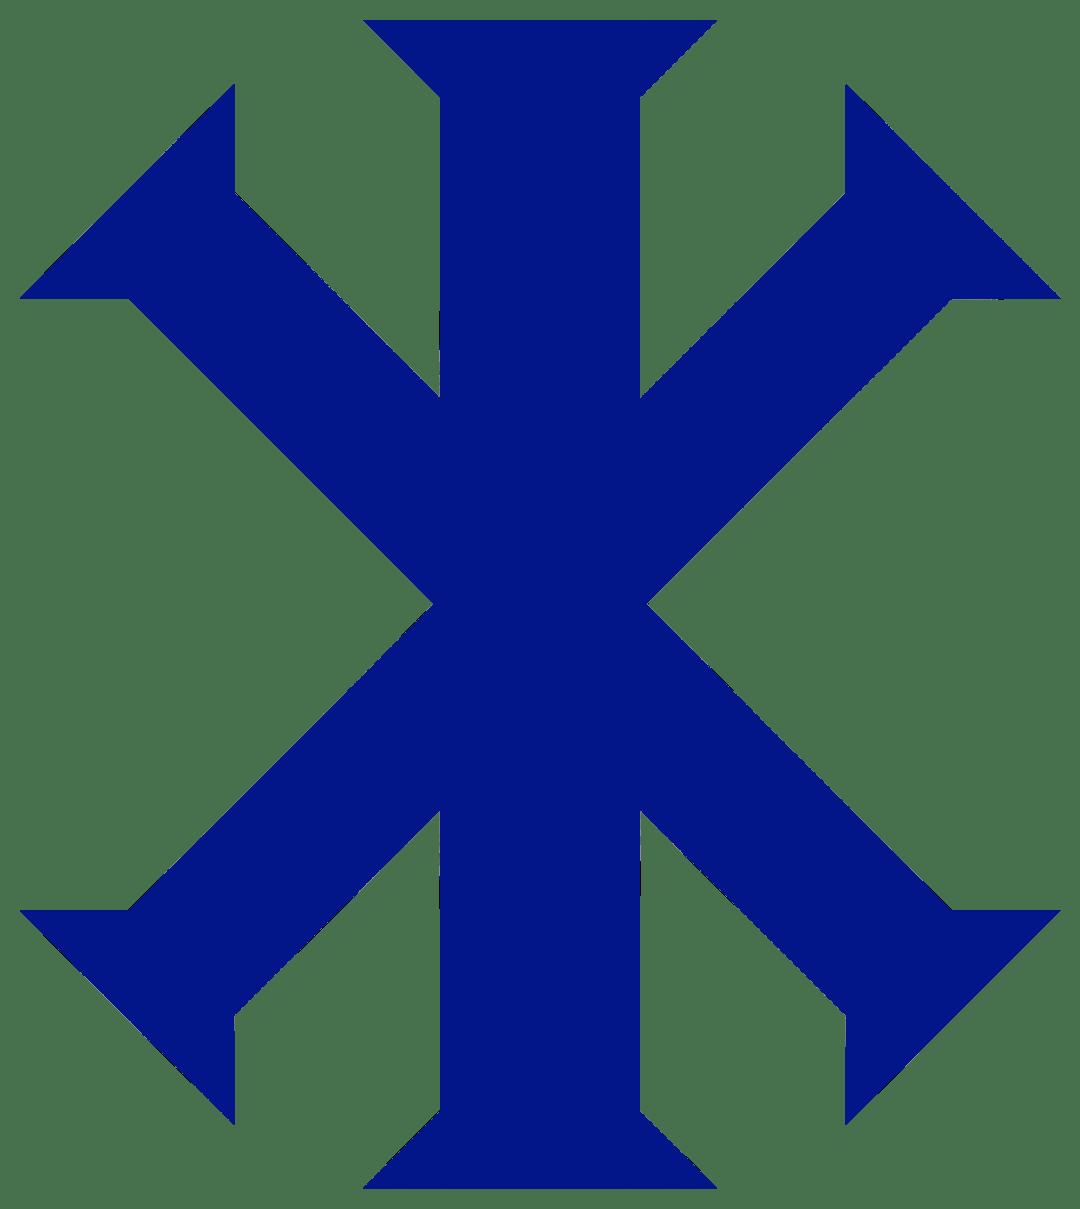 IX monogram  Wikipedia